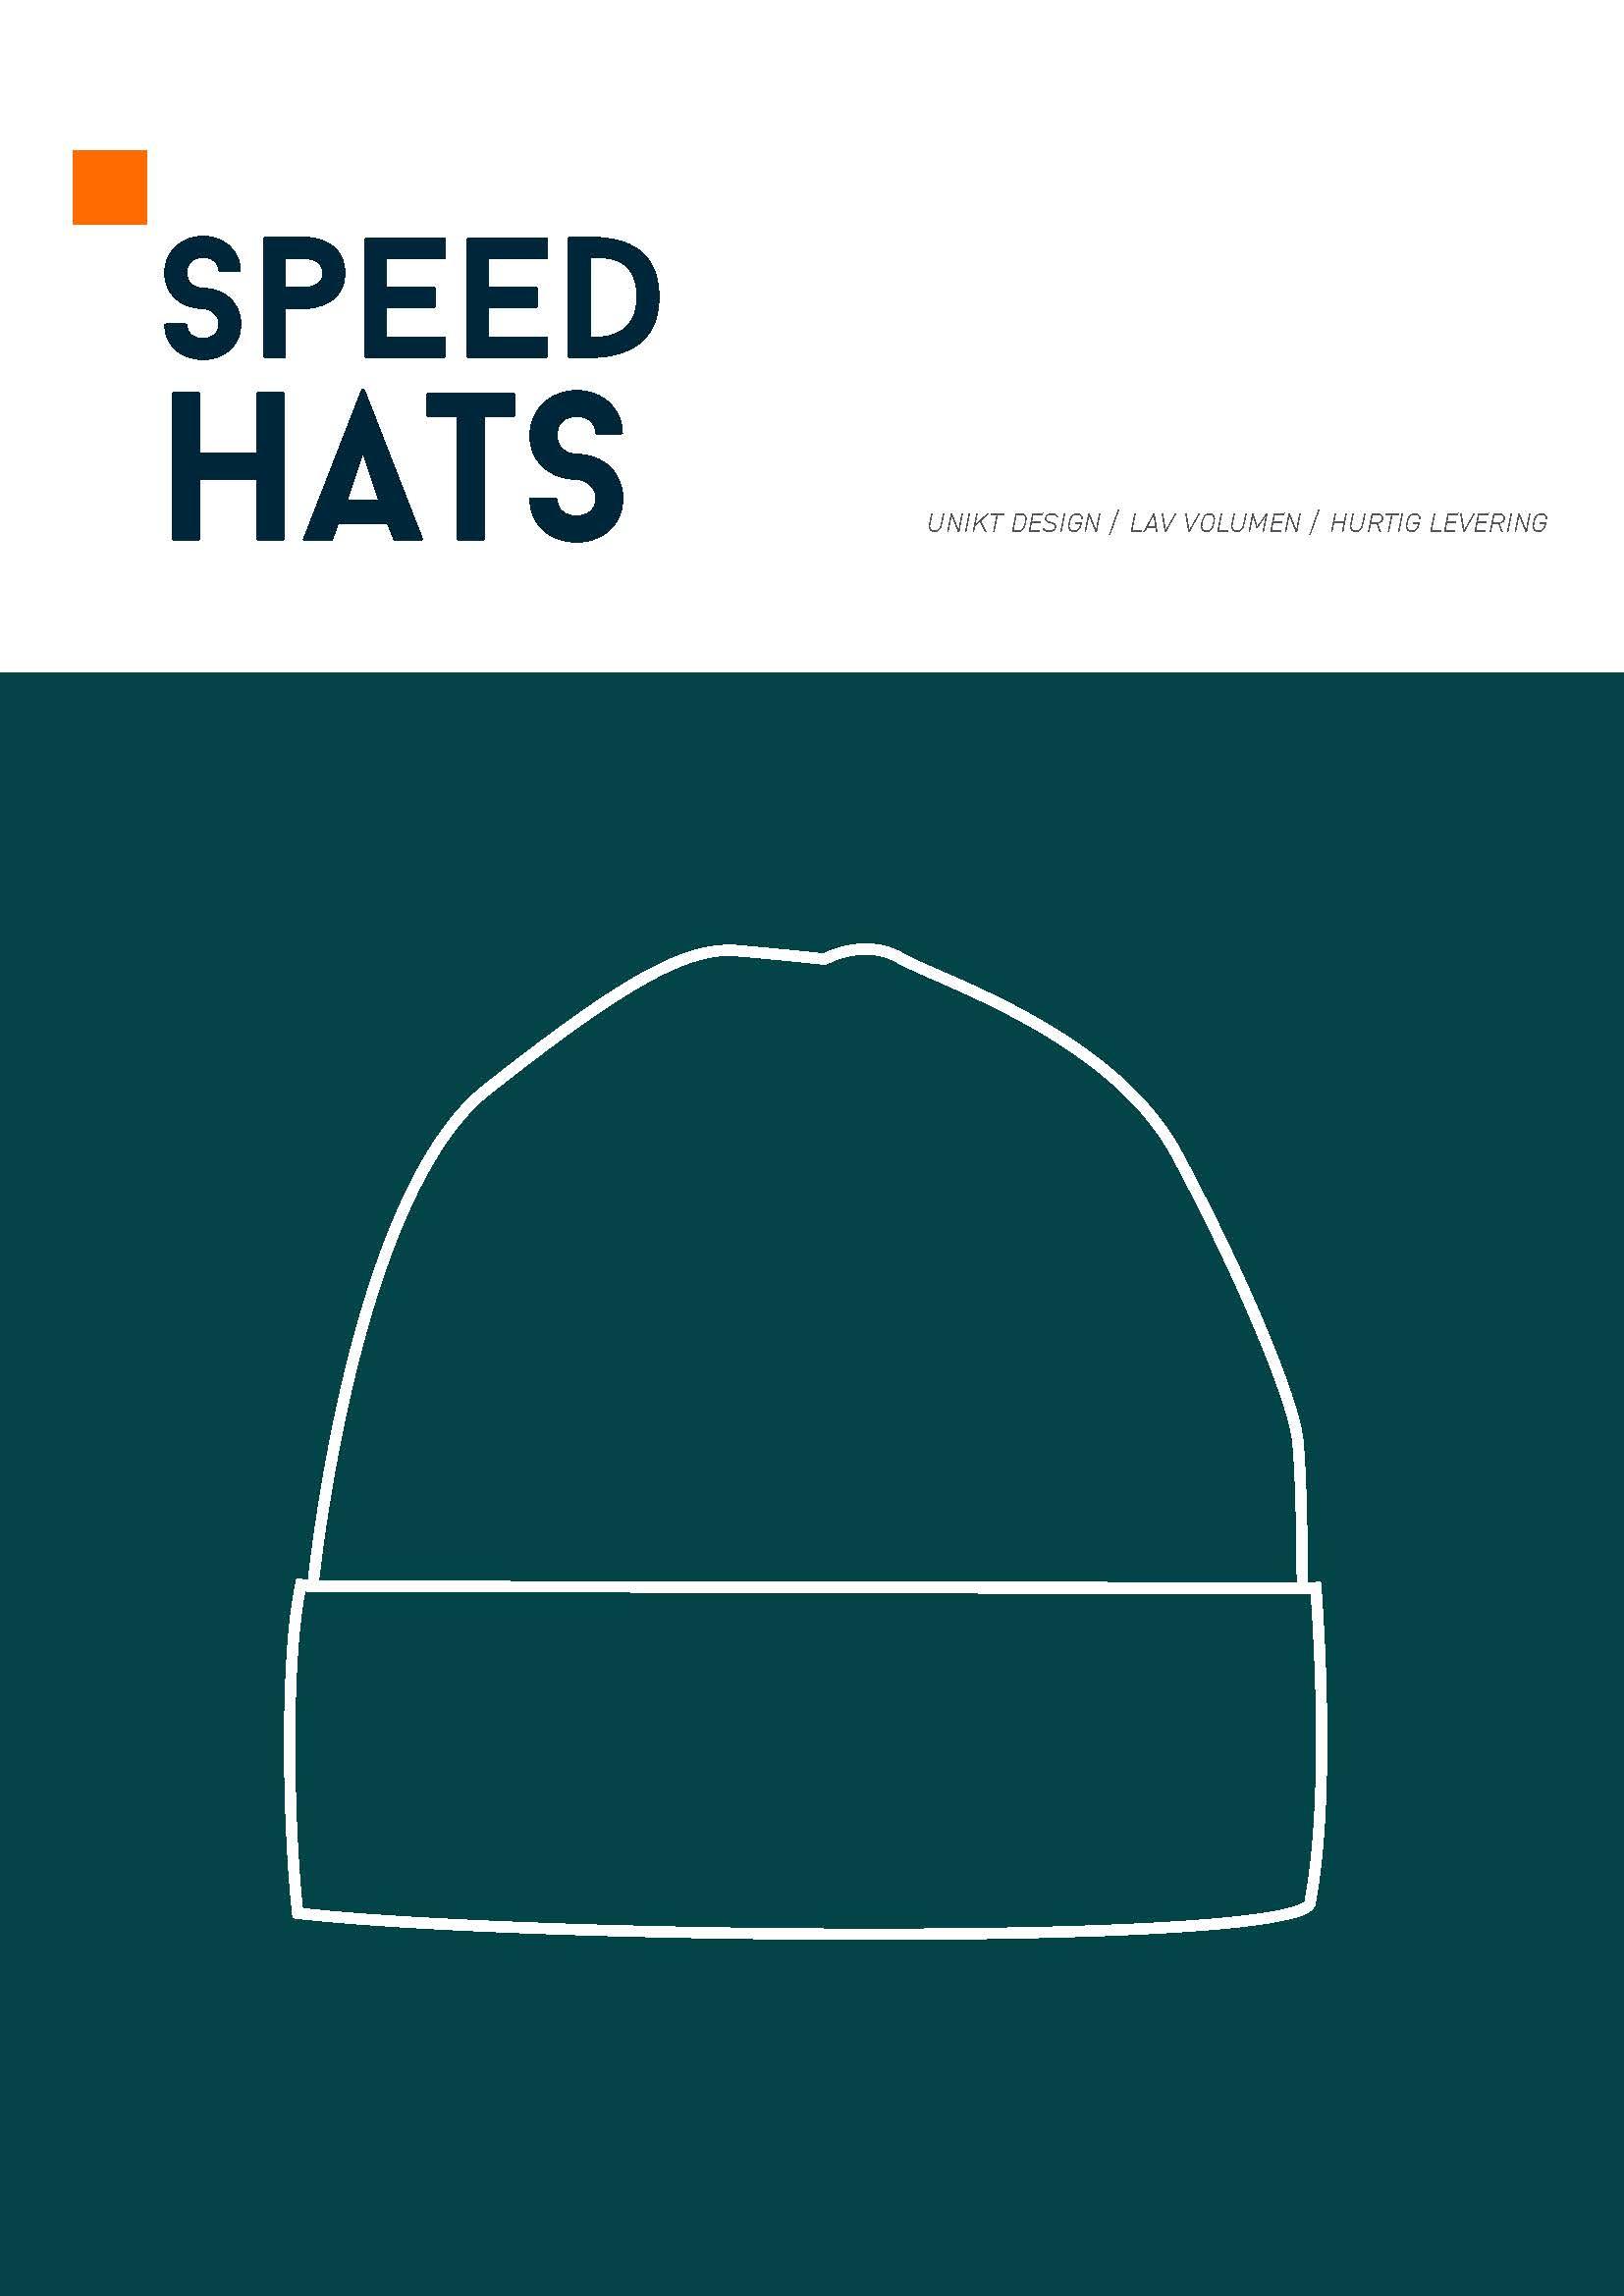 Speed Hats 2020